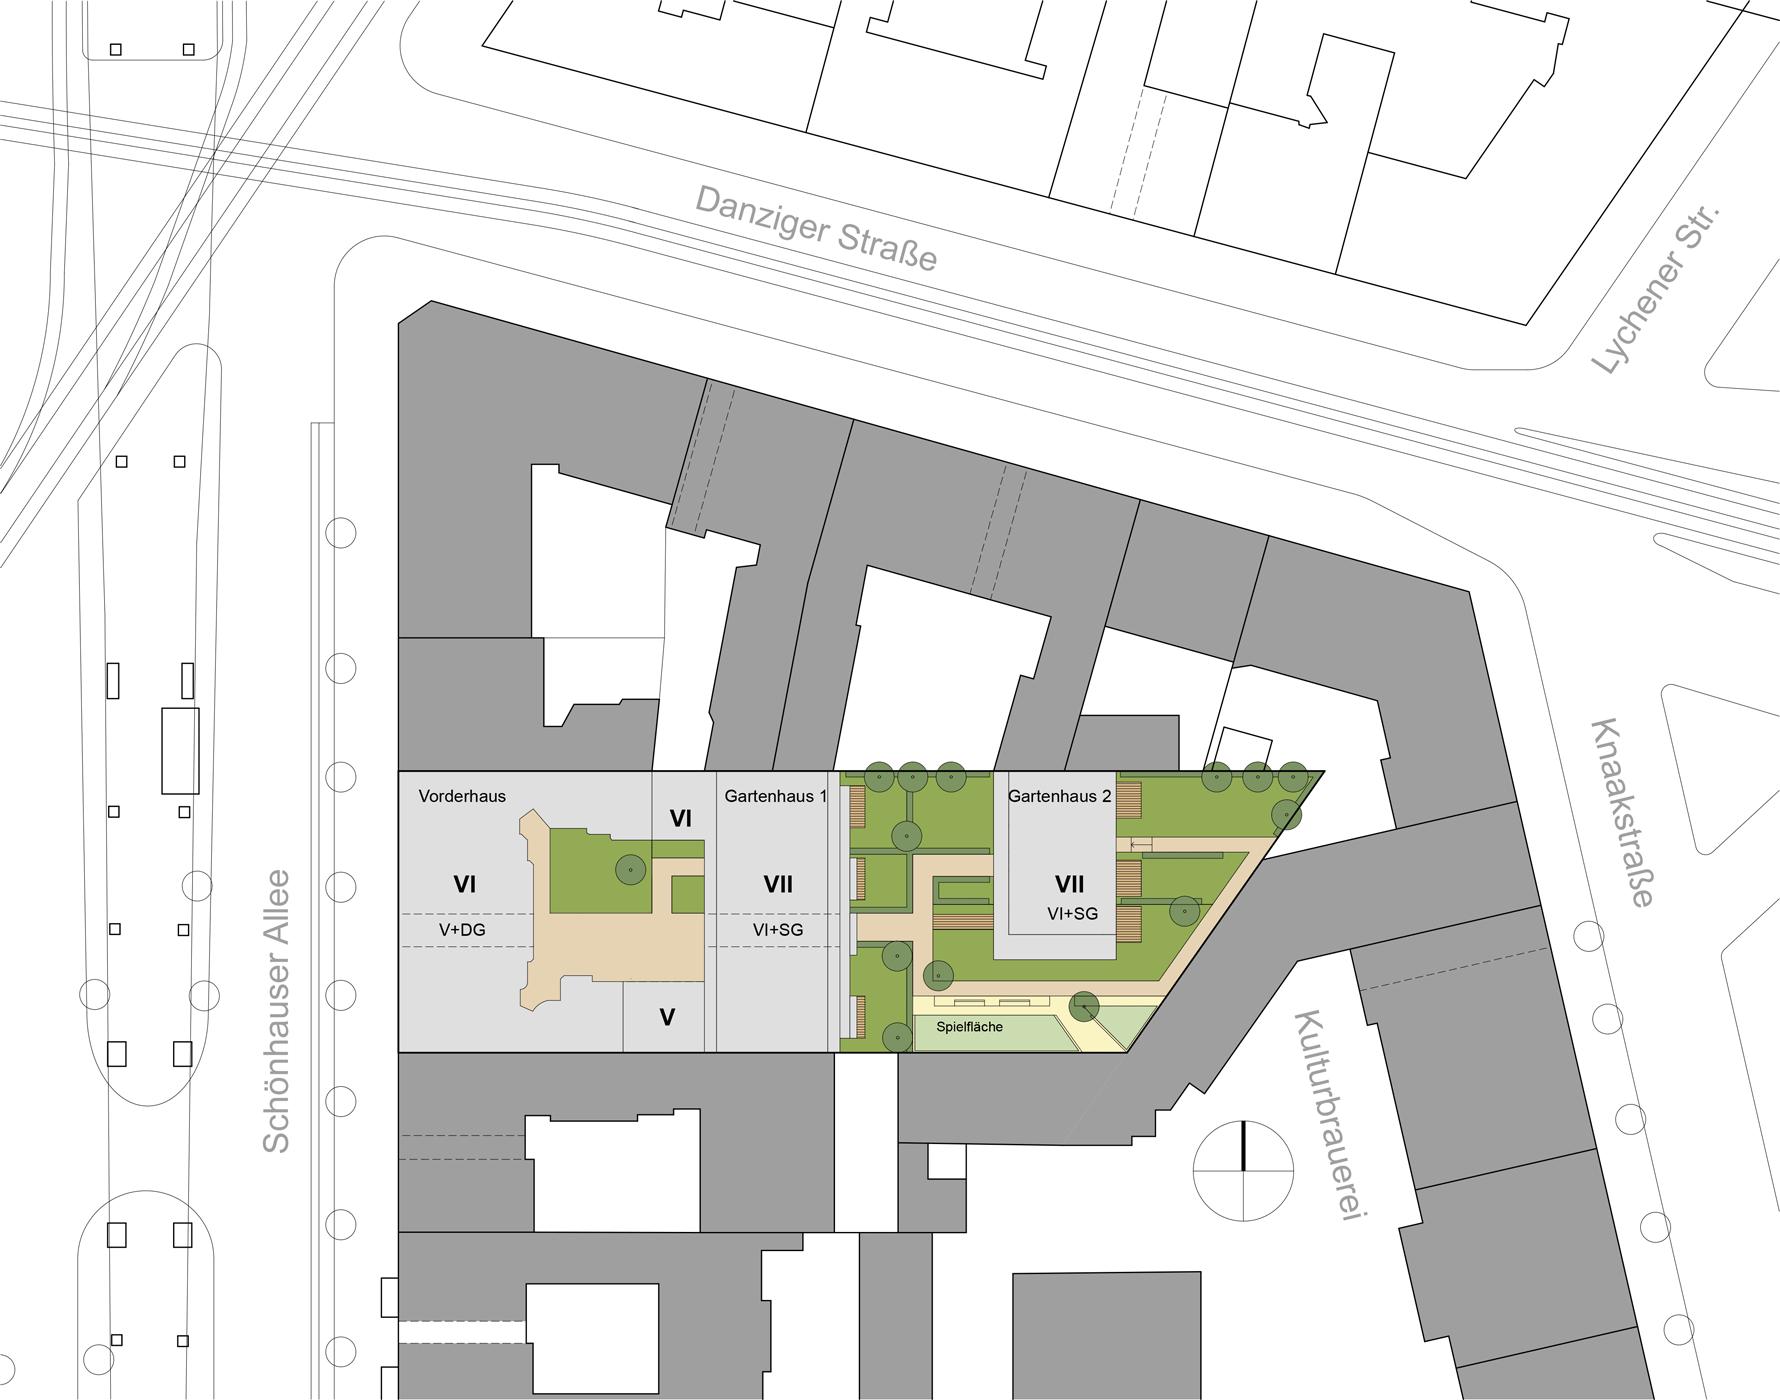 wohnen an der kulturbrauerei berlin prenzlauer berg kampmann architekten gmbh. Black Bedroom Furniture Sets. Home Design Ideas